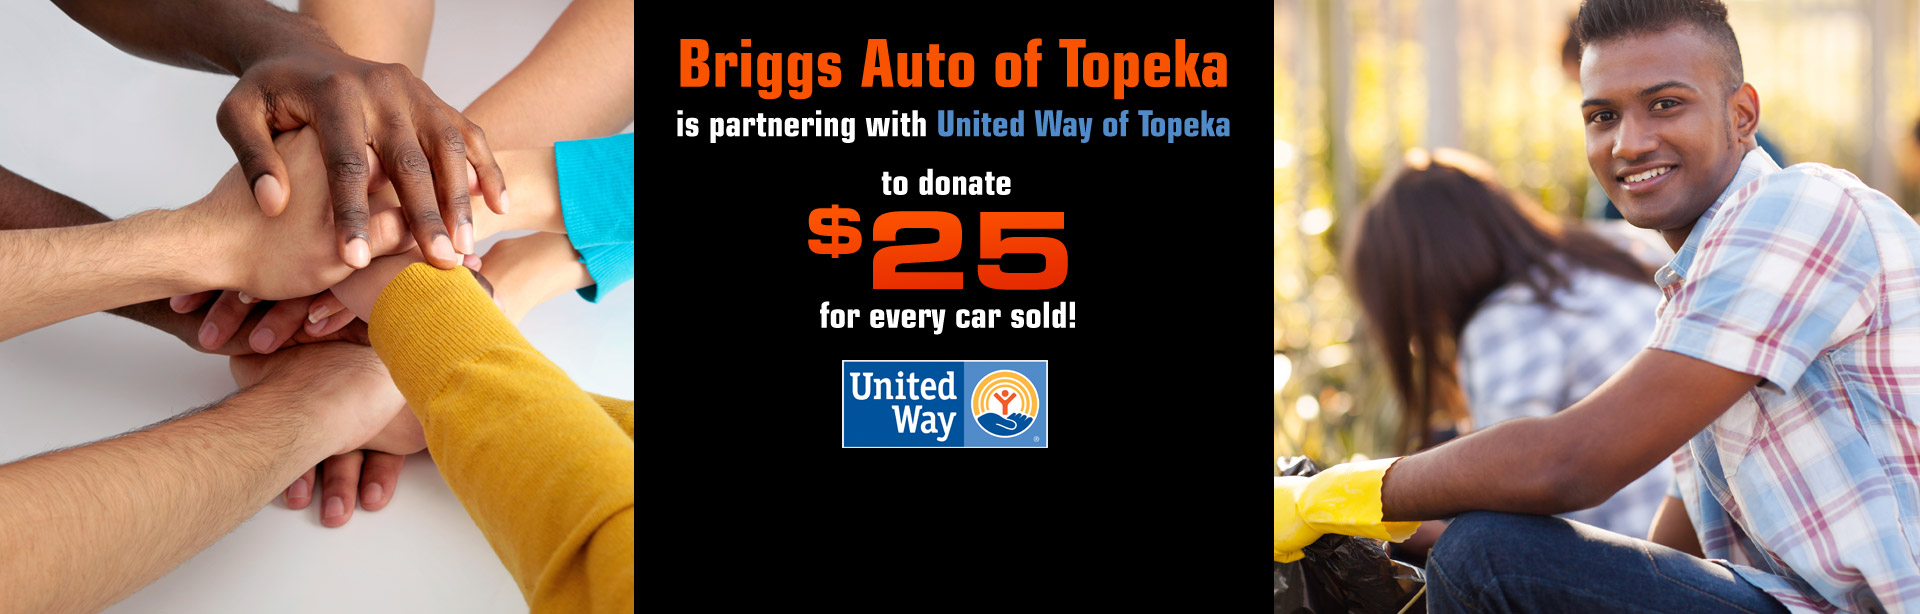 United Way of Topeka